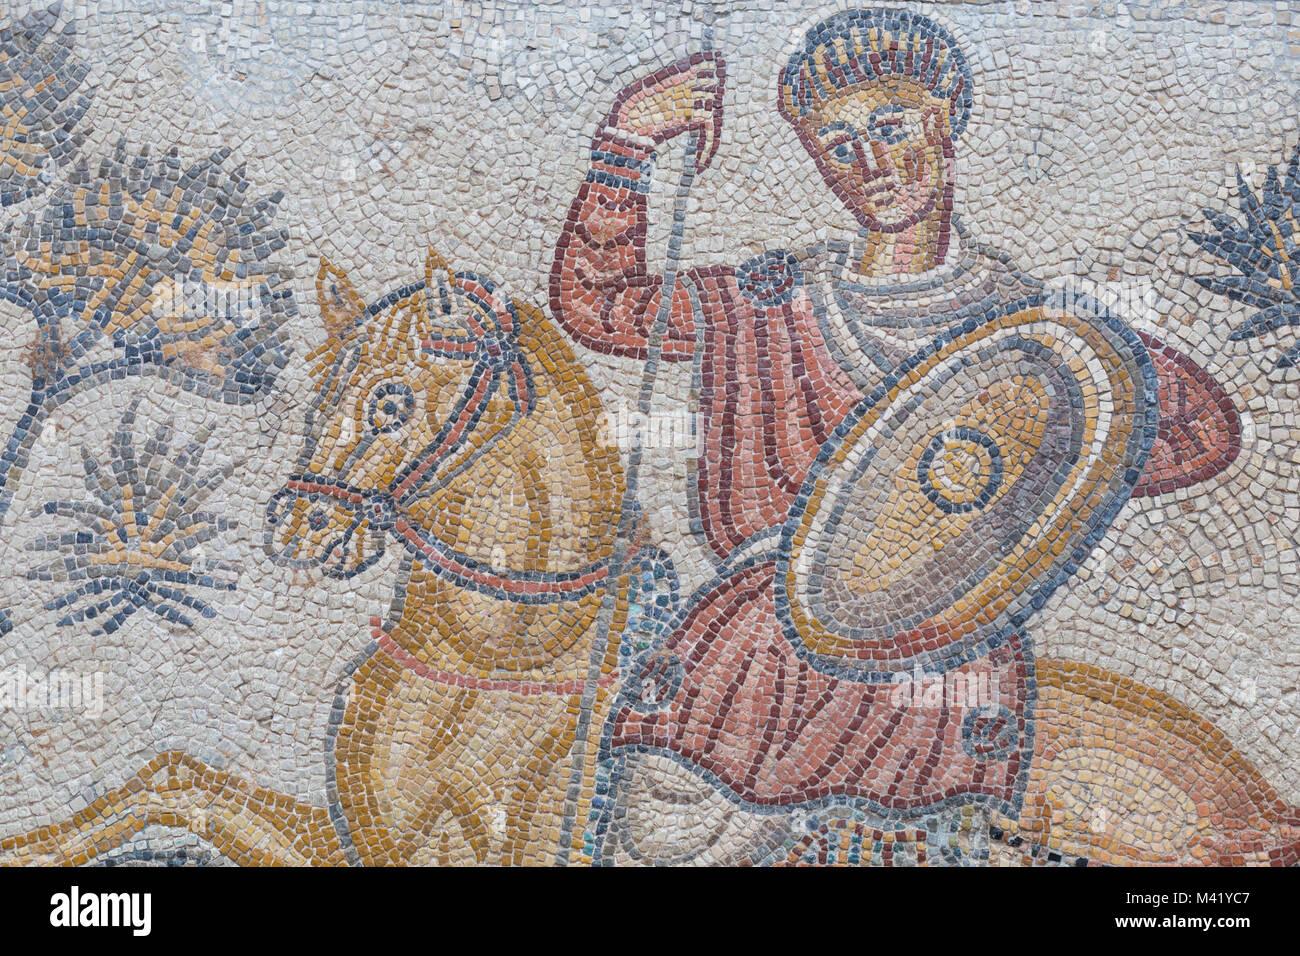 Merida, Spain - December 20th, 2017: Panther hunter roman  mosaic, detail. National Museum of Roman Art in Merida, - Stock Image